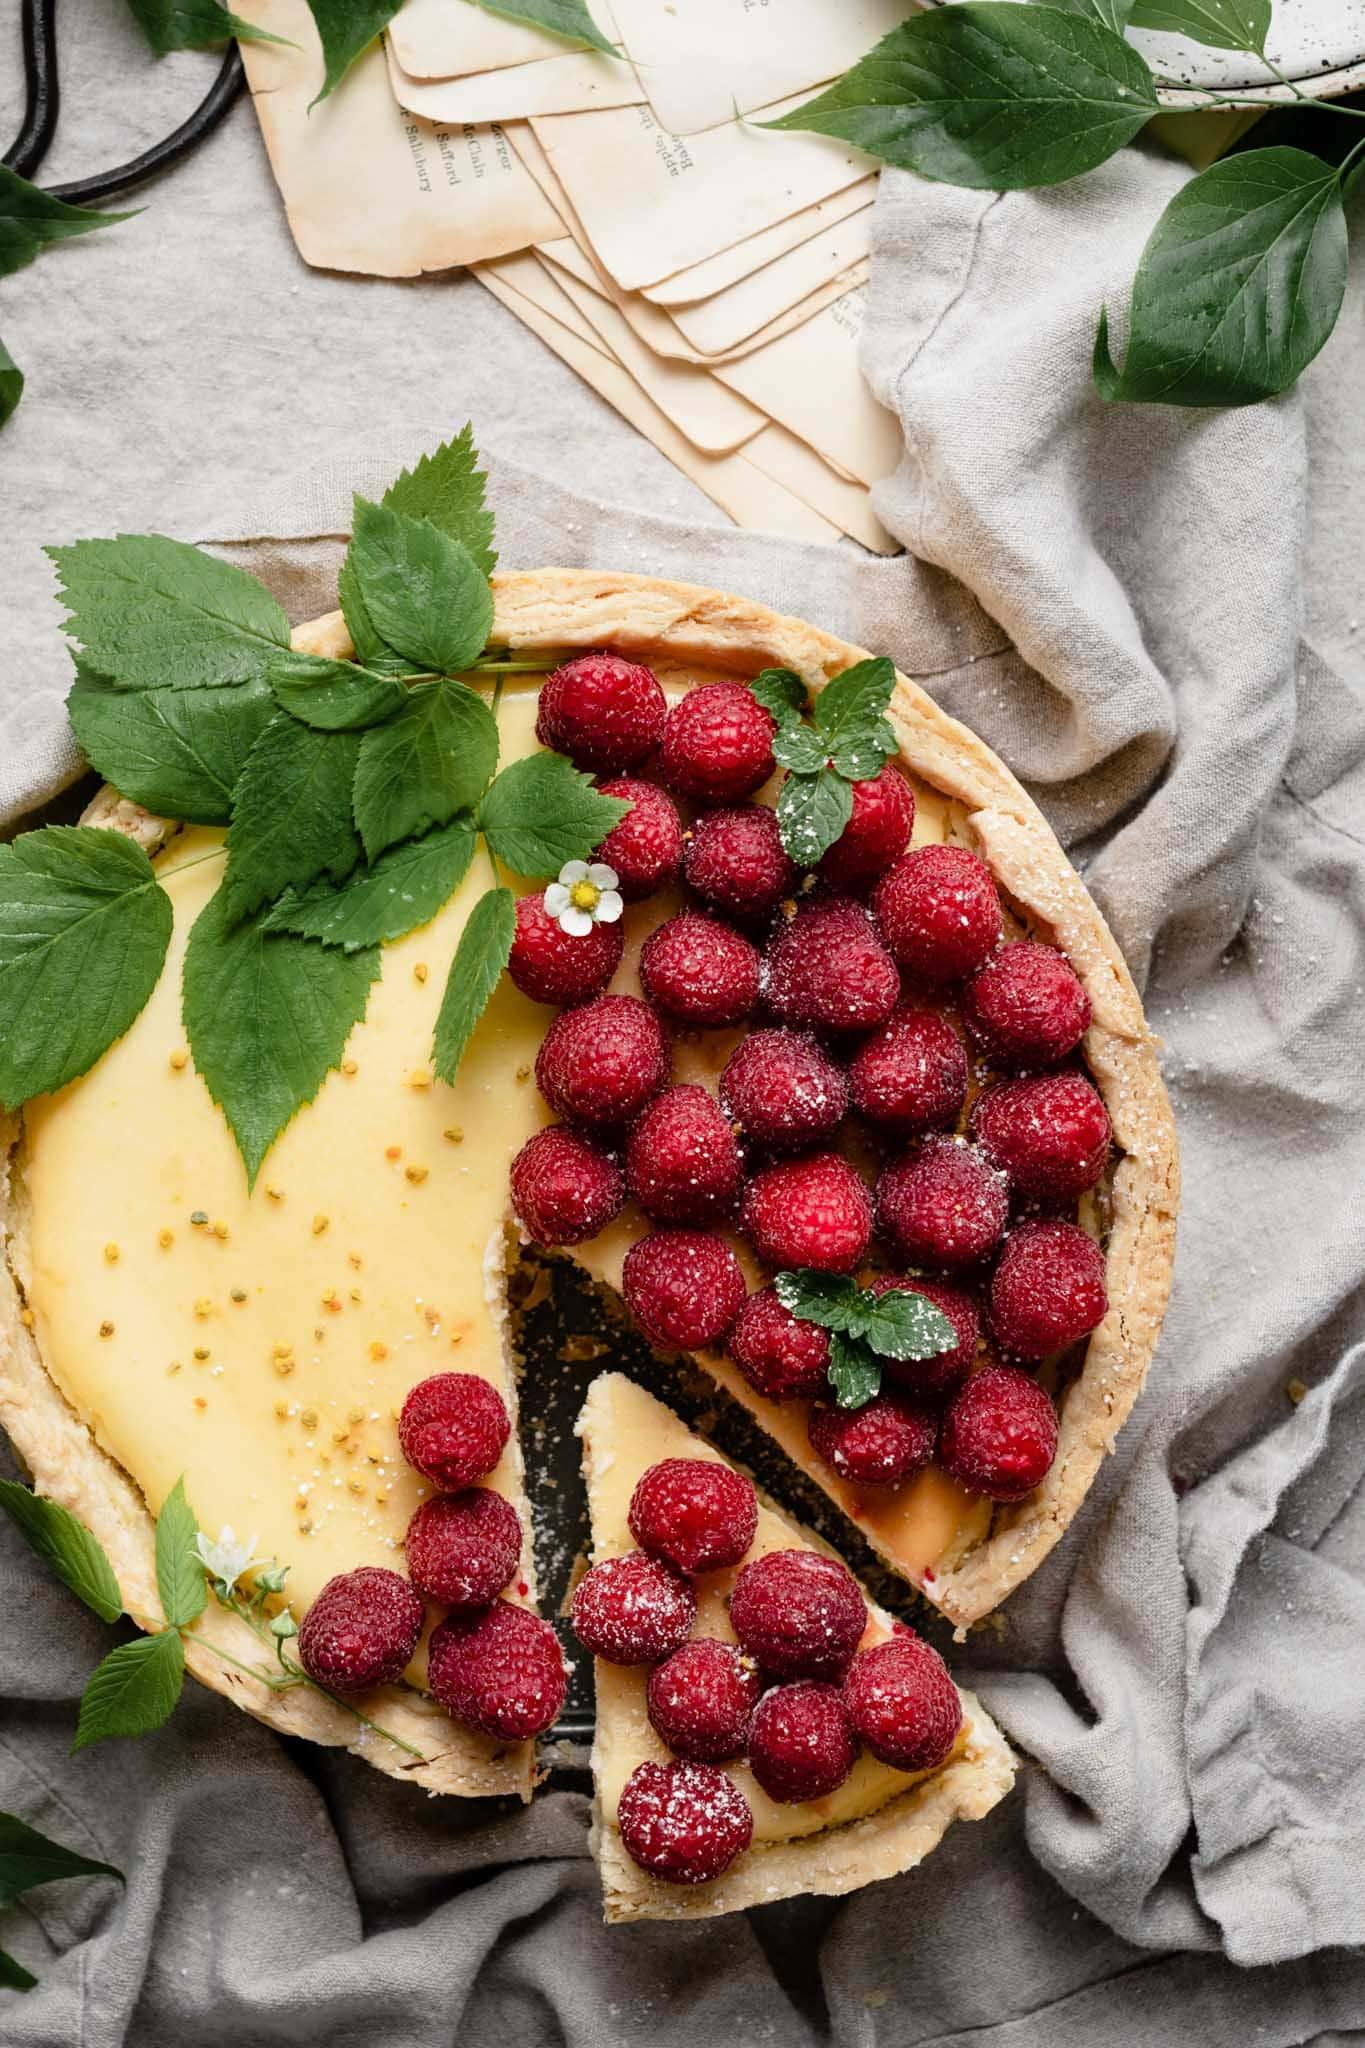 Raspberry topped lemon cheesecake recipe.